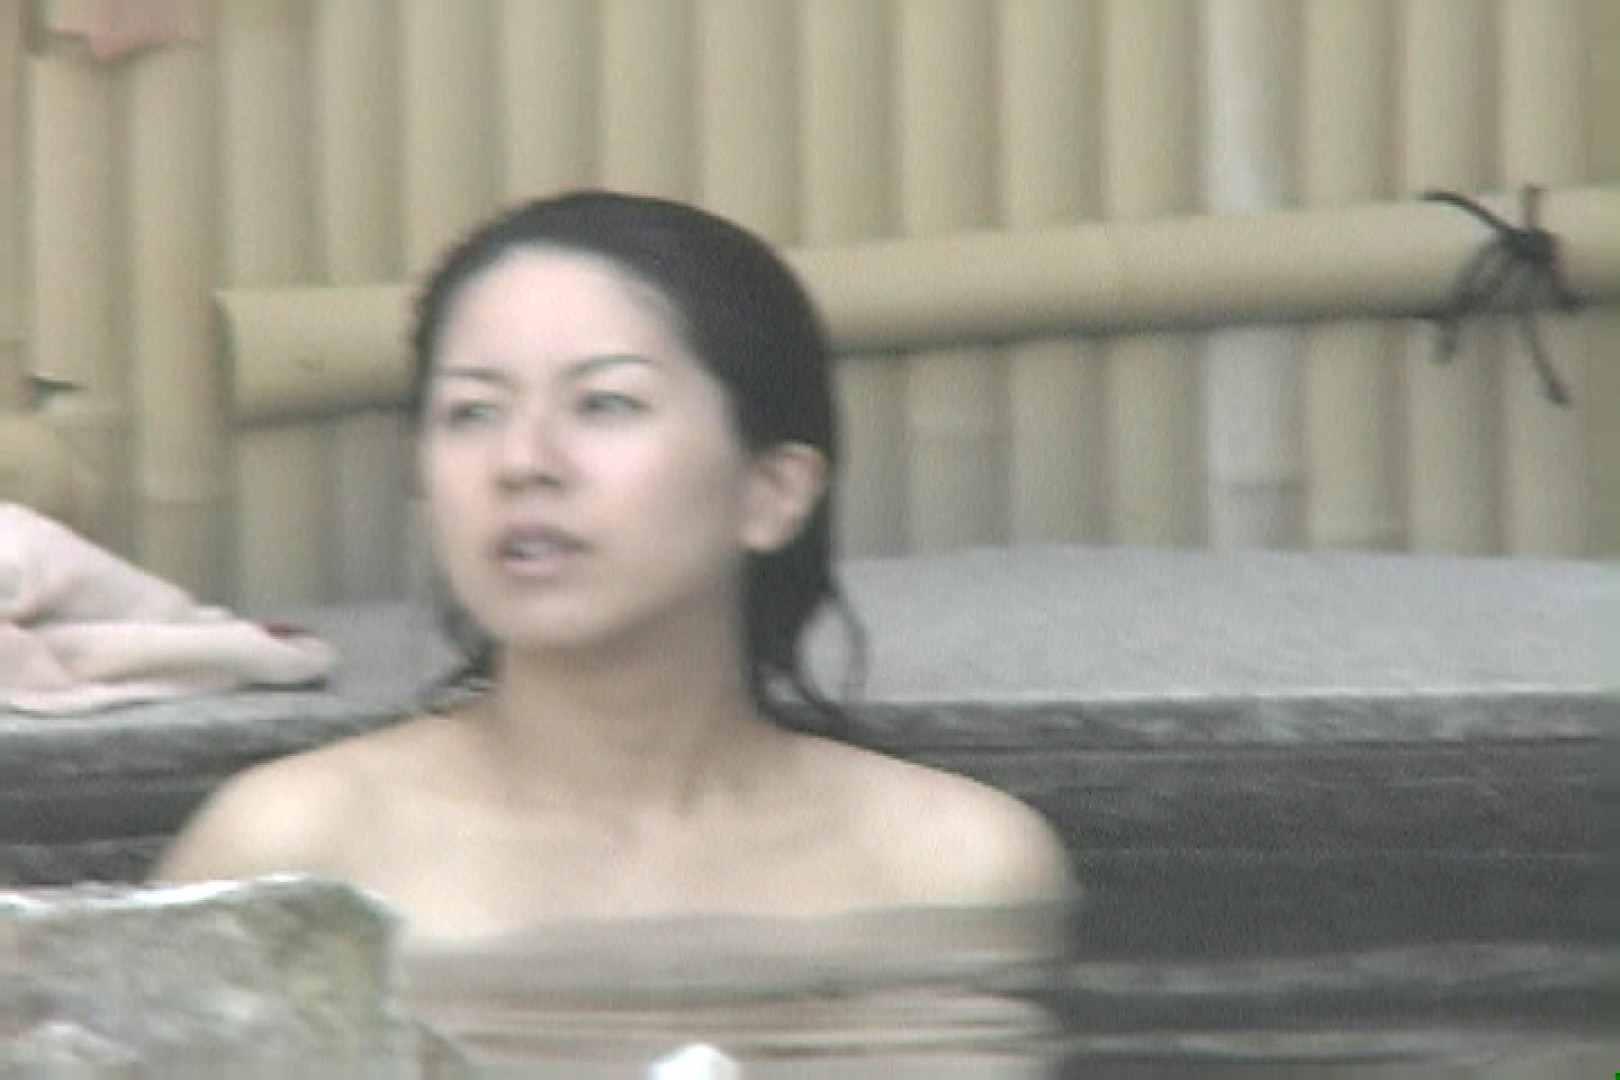 Aquaな露天風呂Vol.694 盗撮 AV無料 67画像 2